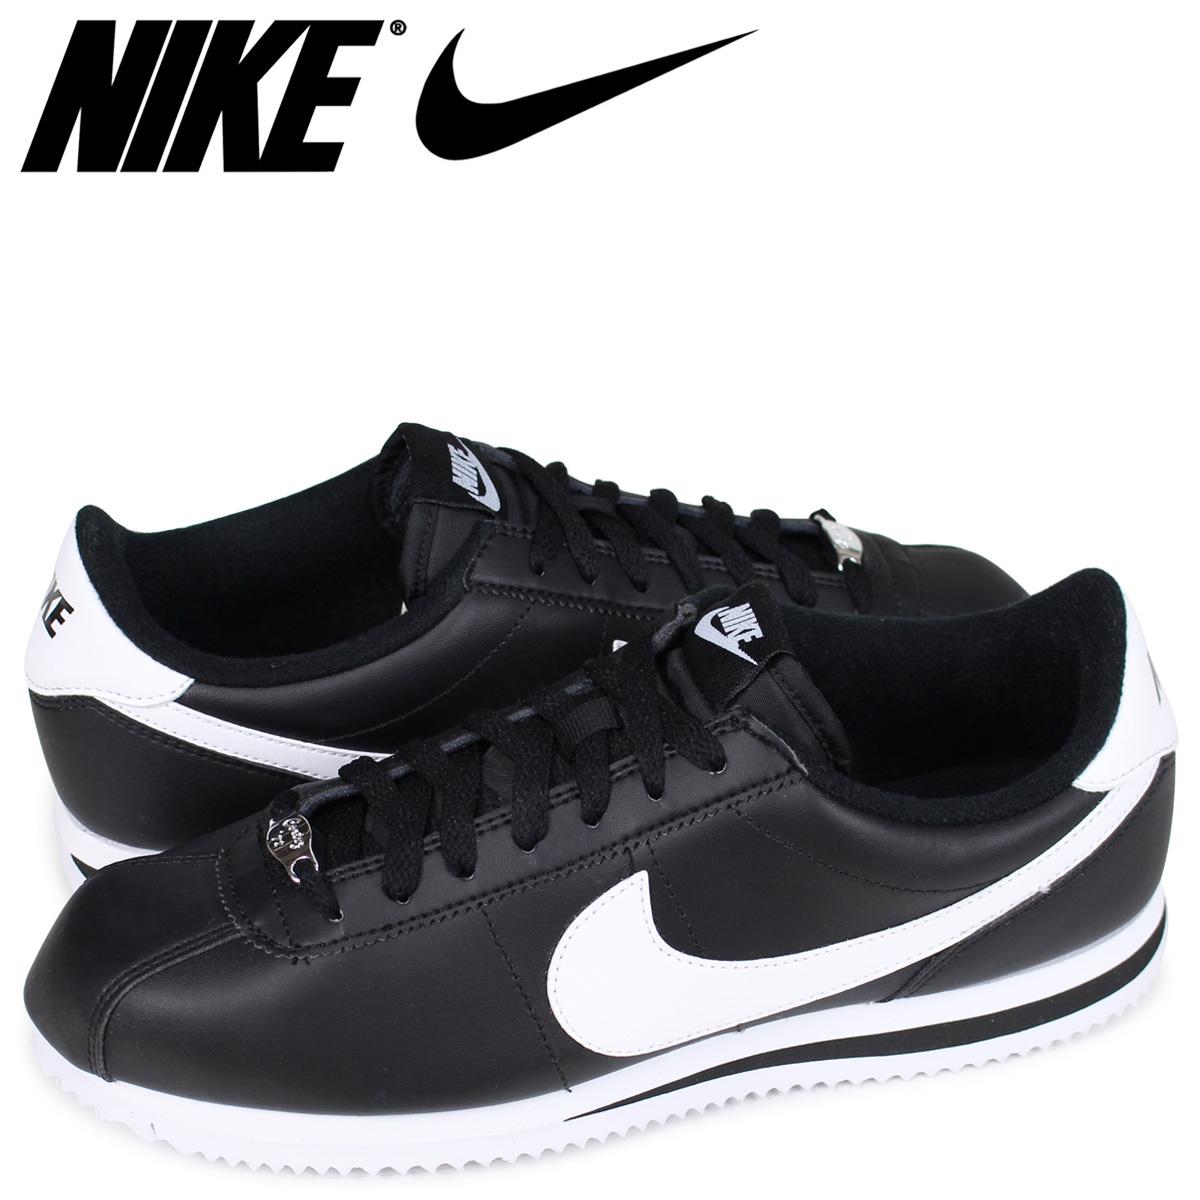 on sale 04326 91c5b ... sweden nike nike cortez sneakers cortez basic leather 819719 012 mens  shoes black d83a4 eff7a